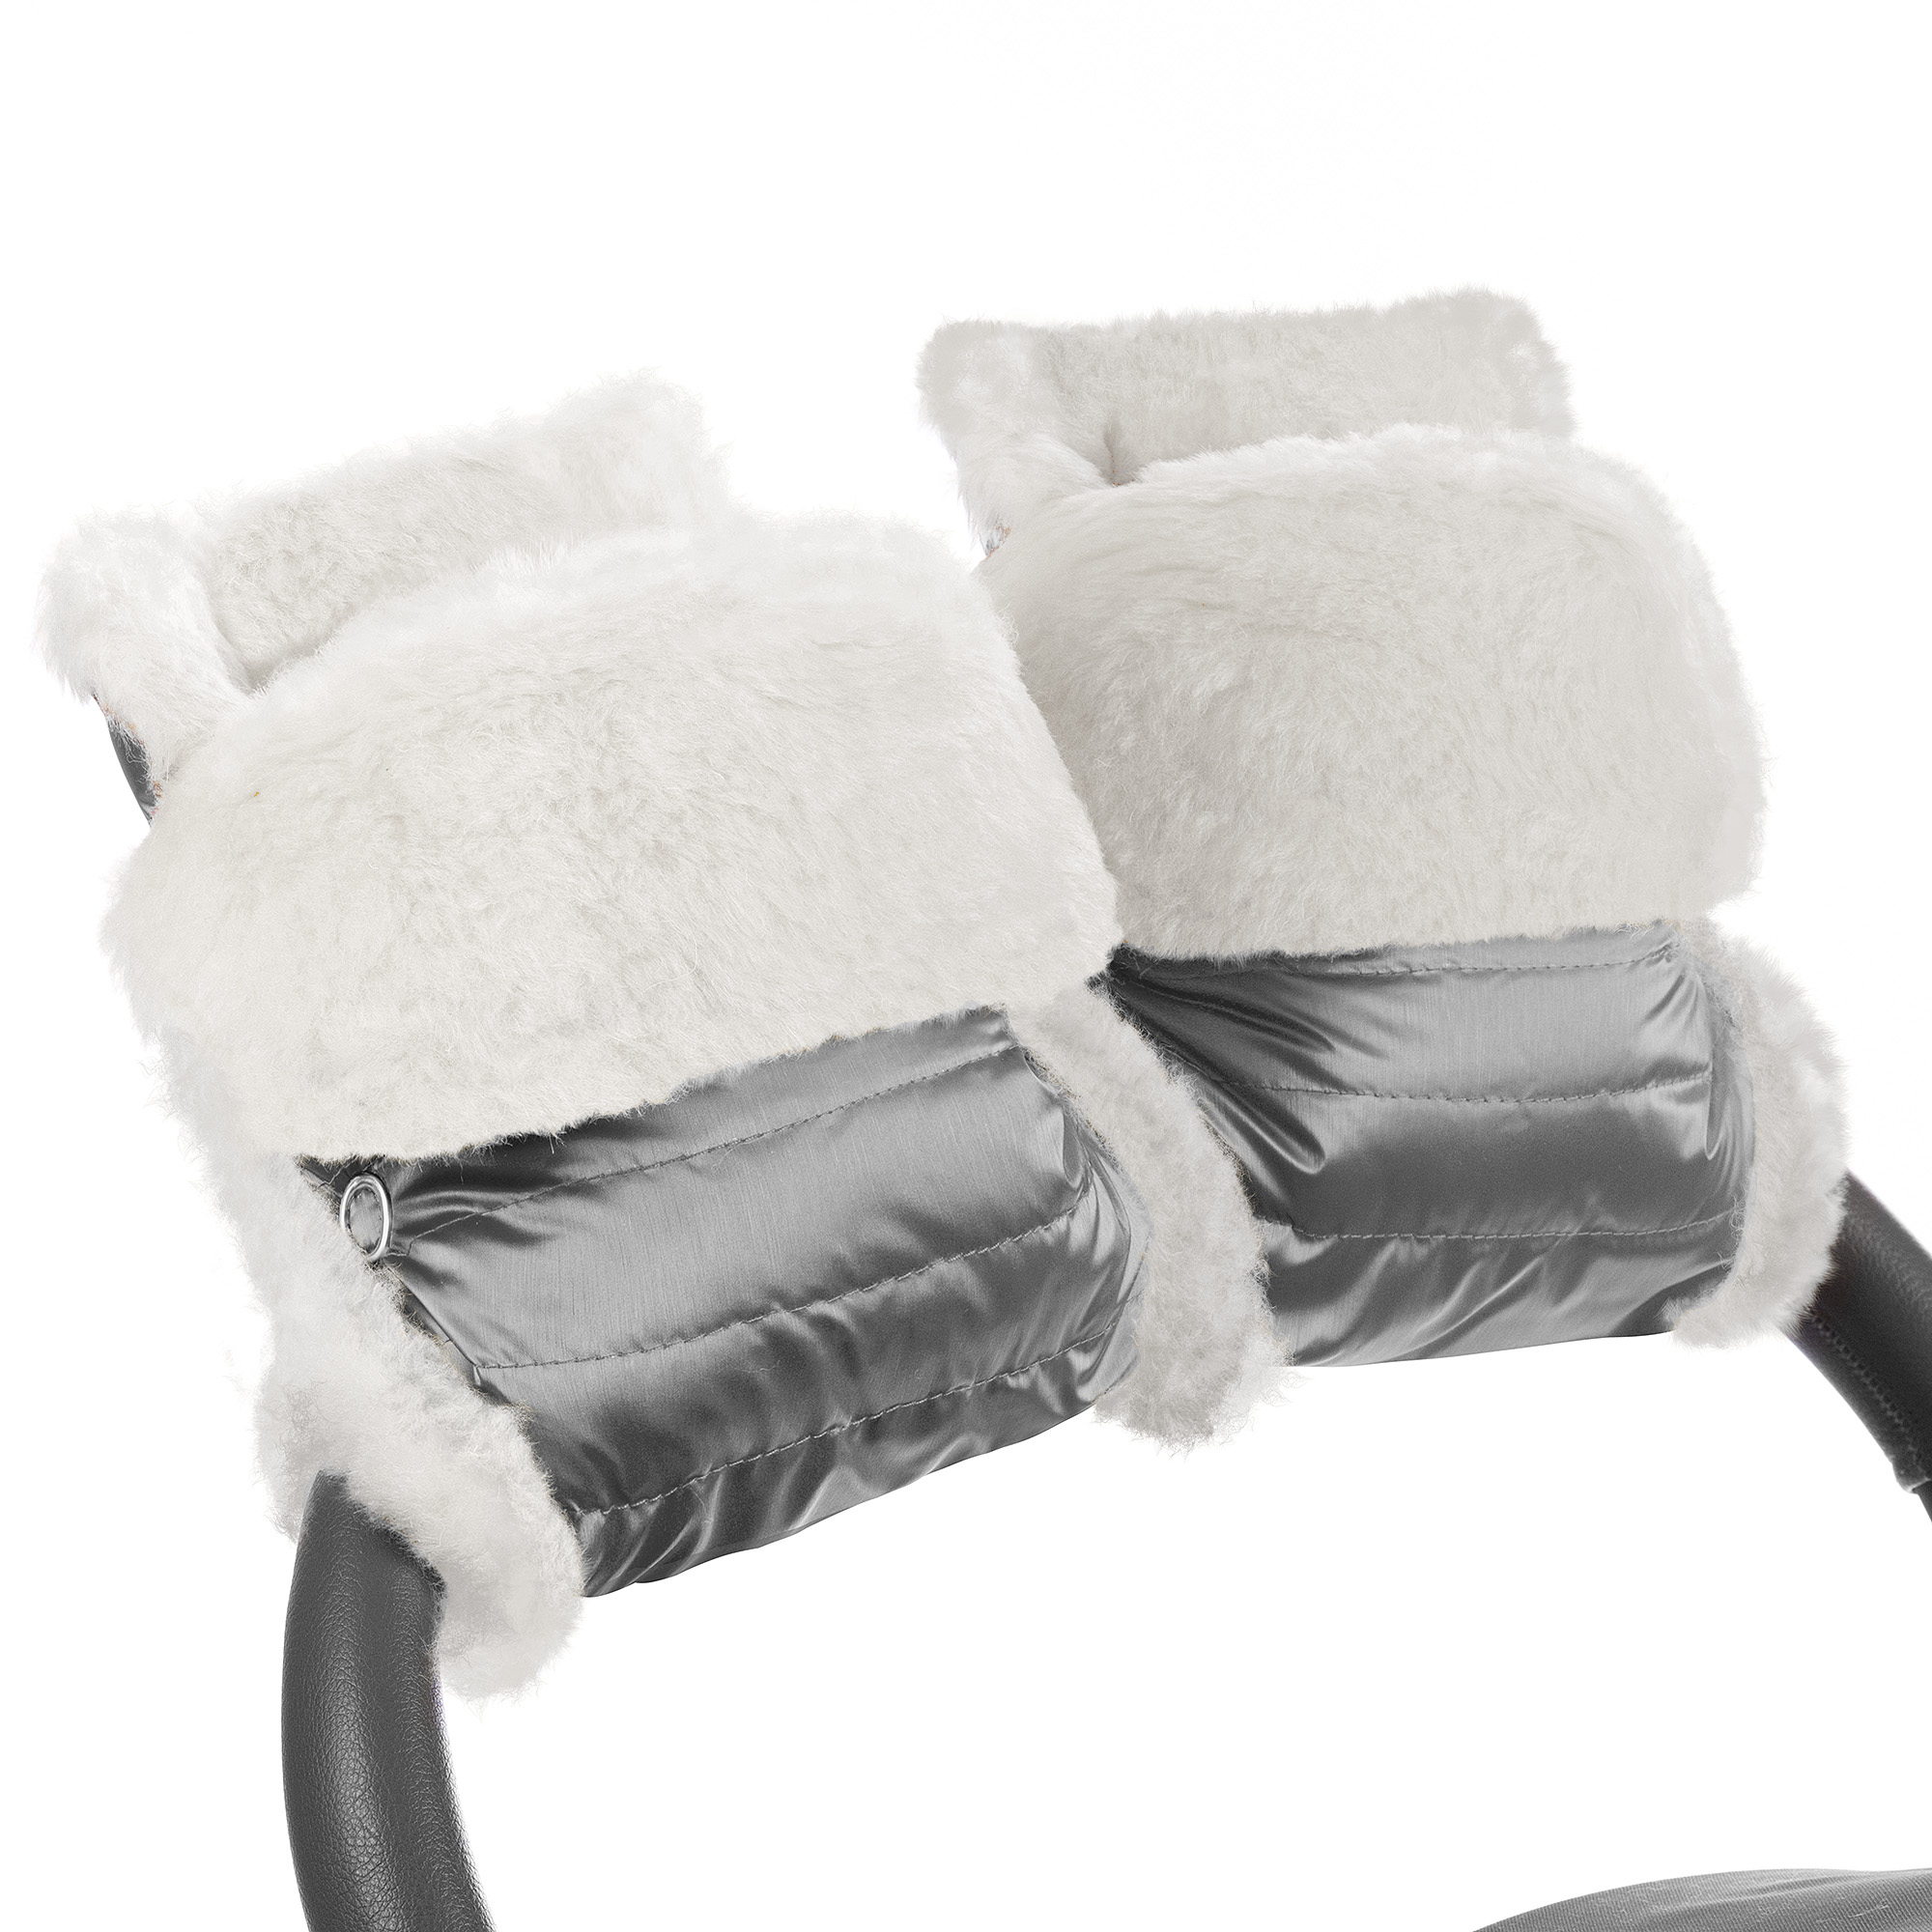 Муфта-рукавички для коляски Esspero Christer Graphite Натуральная шерсть фото